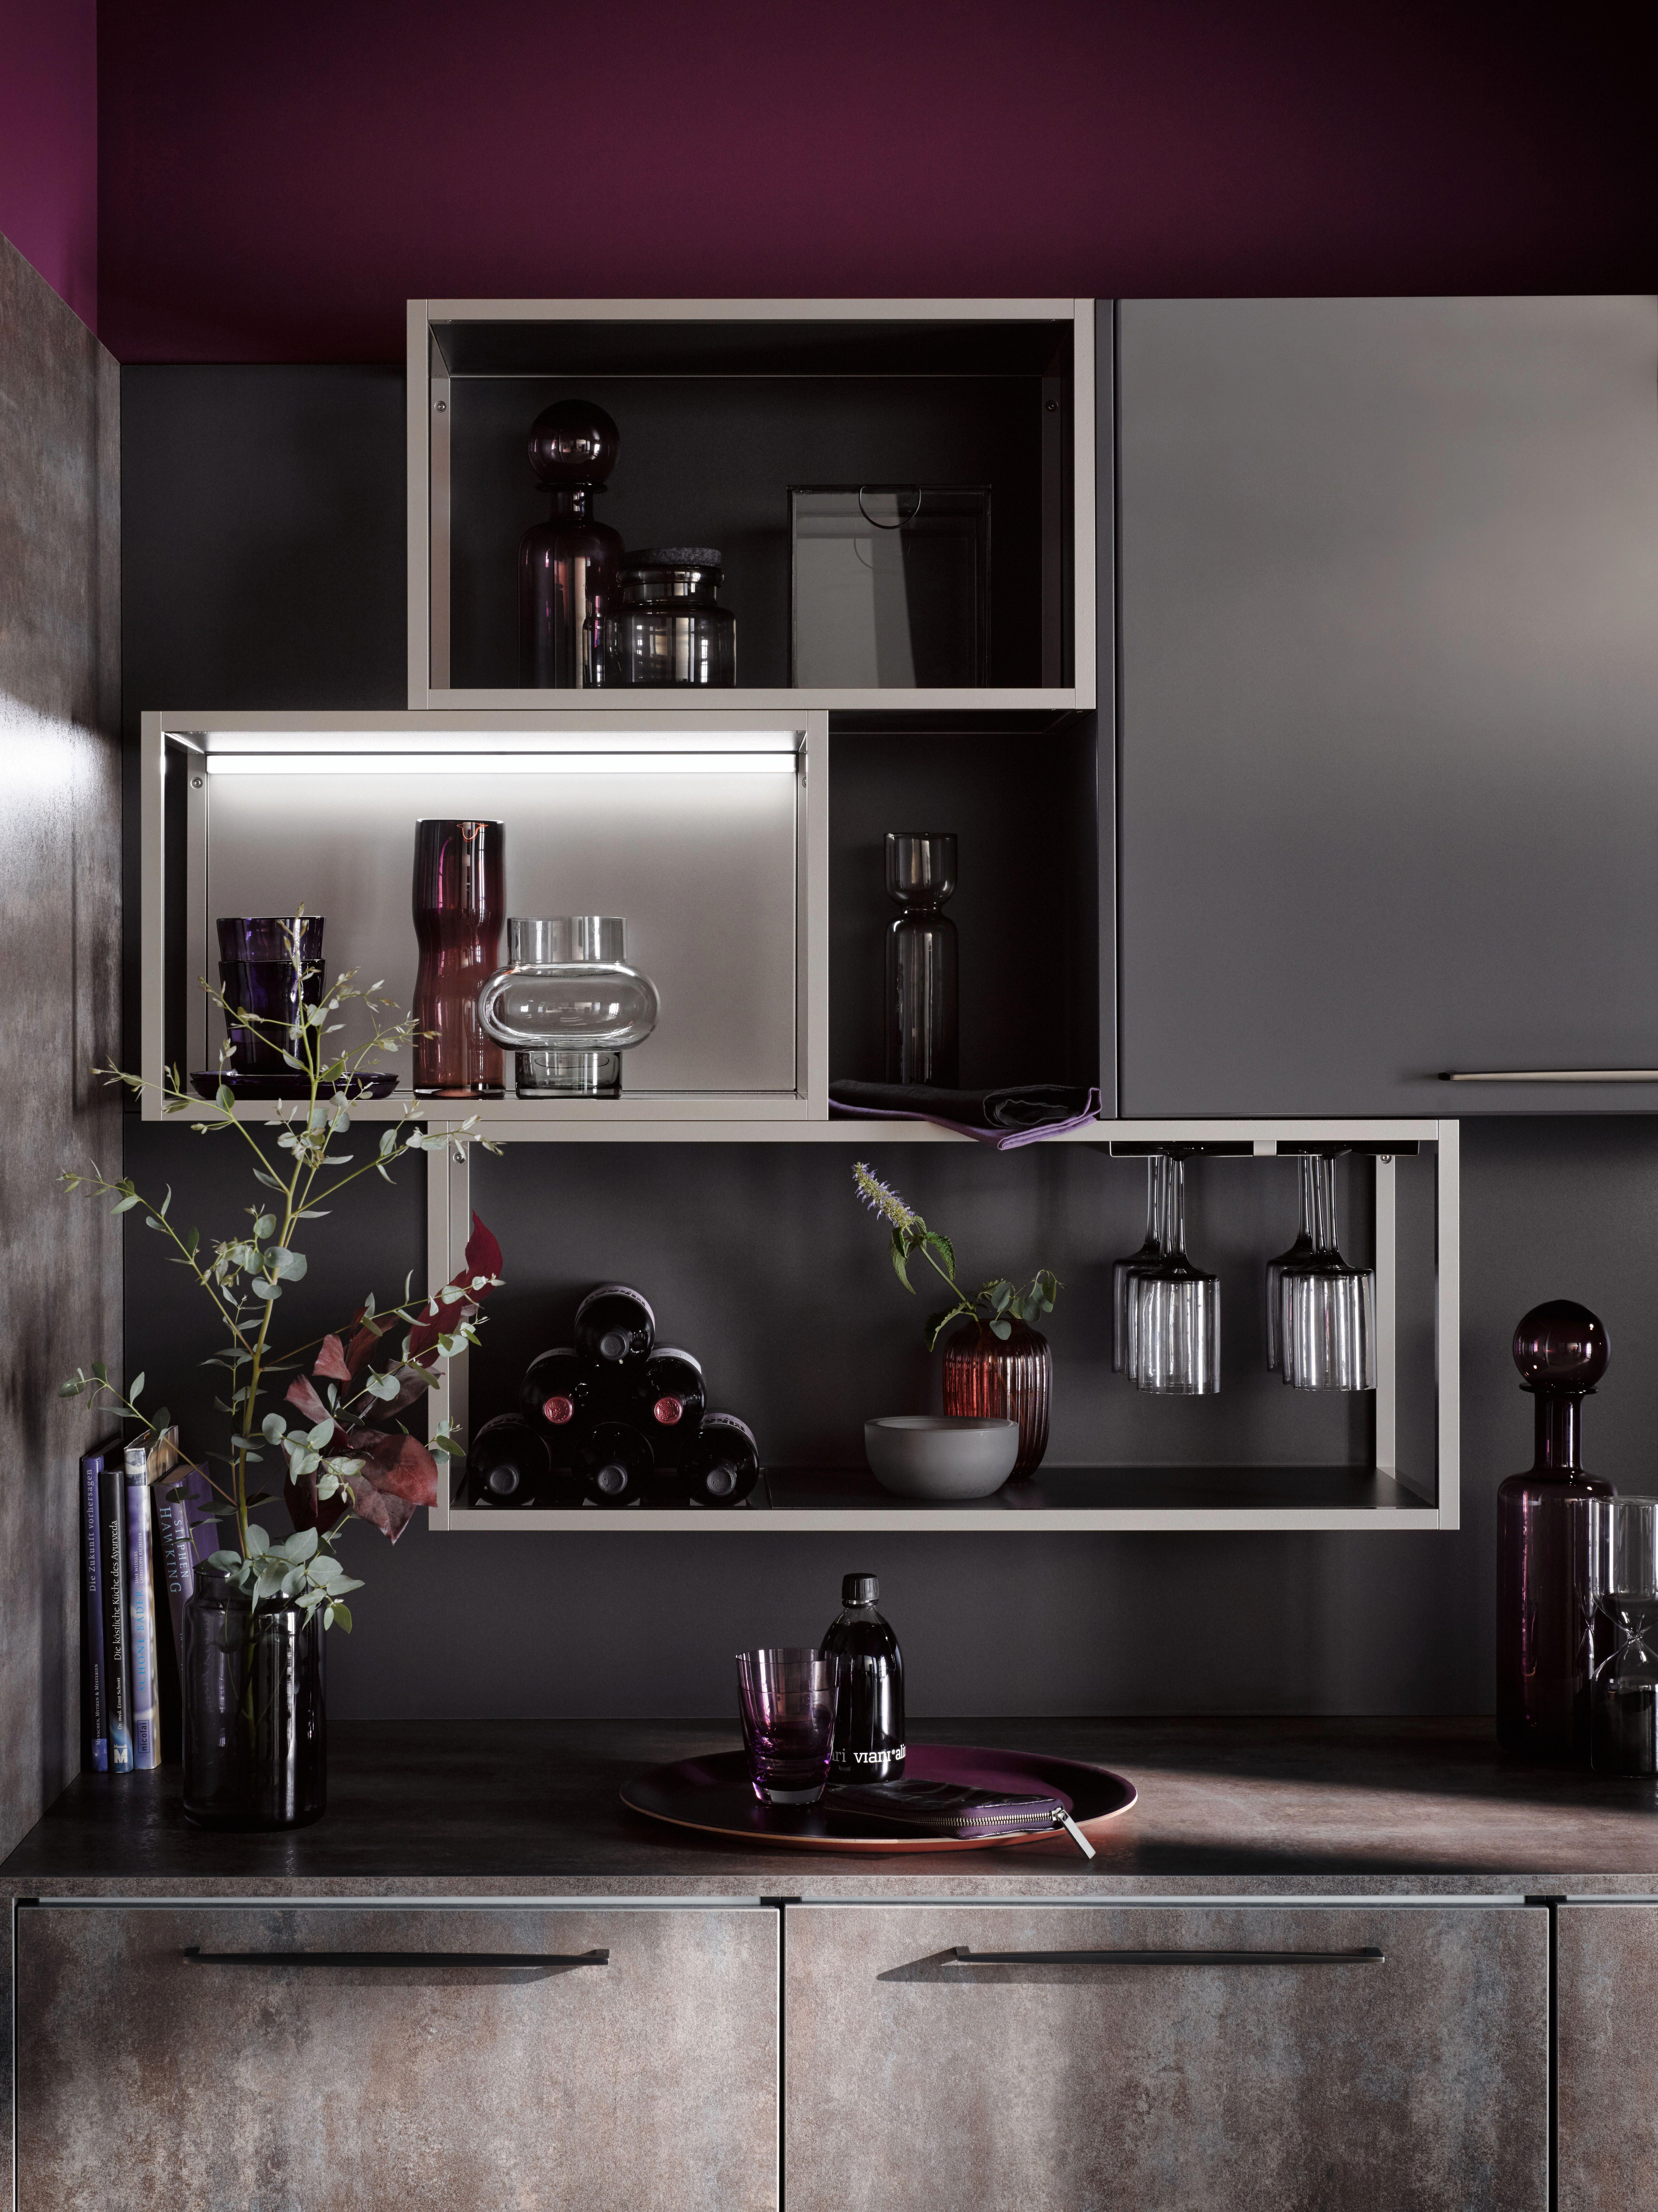 Cabinets Design Ideas Kitchen Metal Metalcabinetmakeover Metalkitchencabinets 35 Be In 2020 Metal Kitchen Cabinets Steel Kitchen Cabinets Kitchen Cabinet Styles